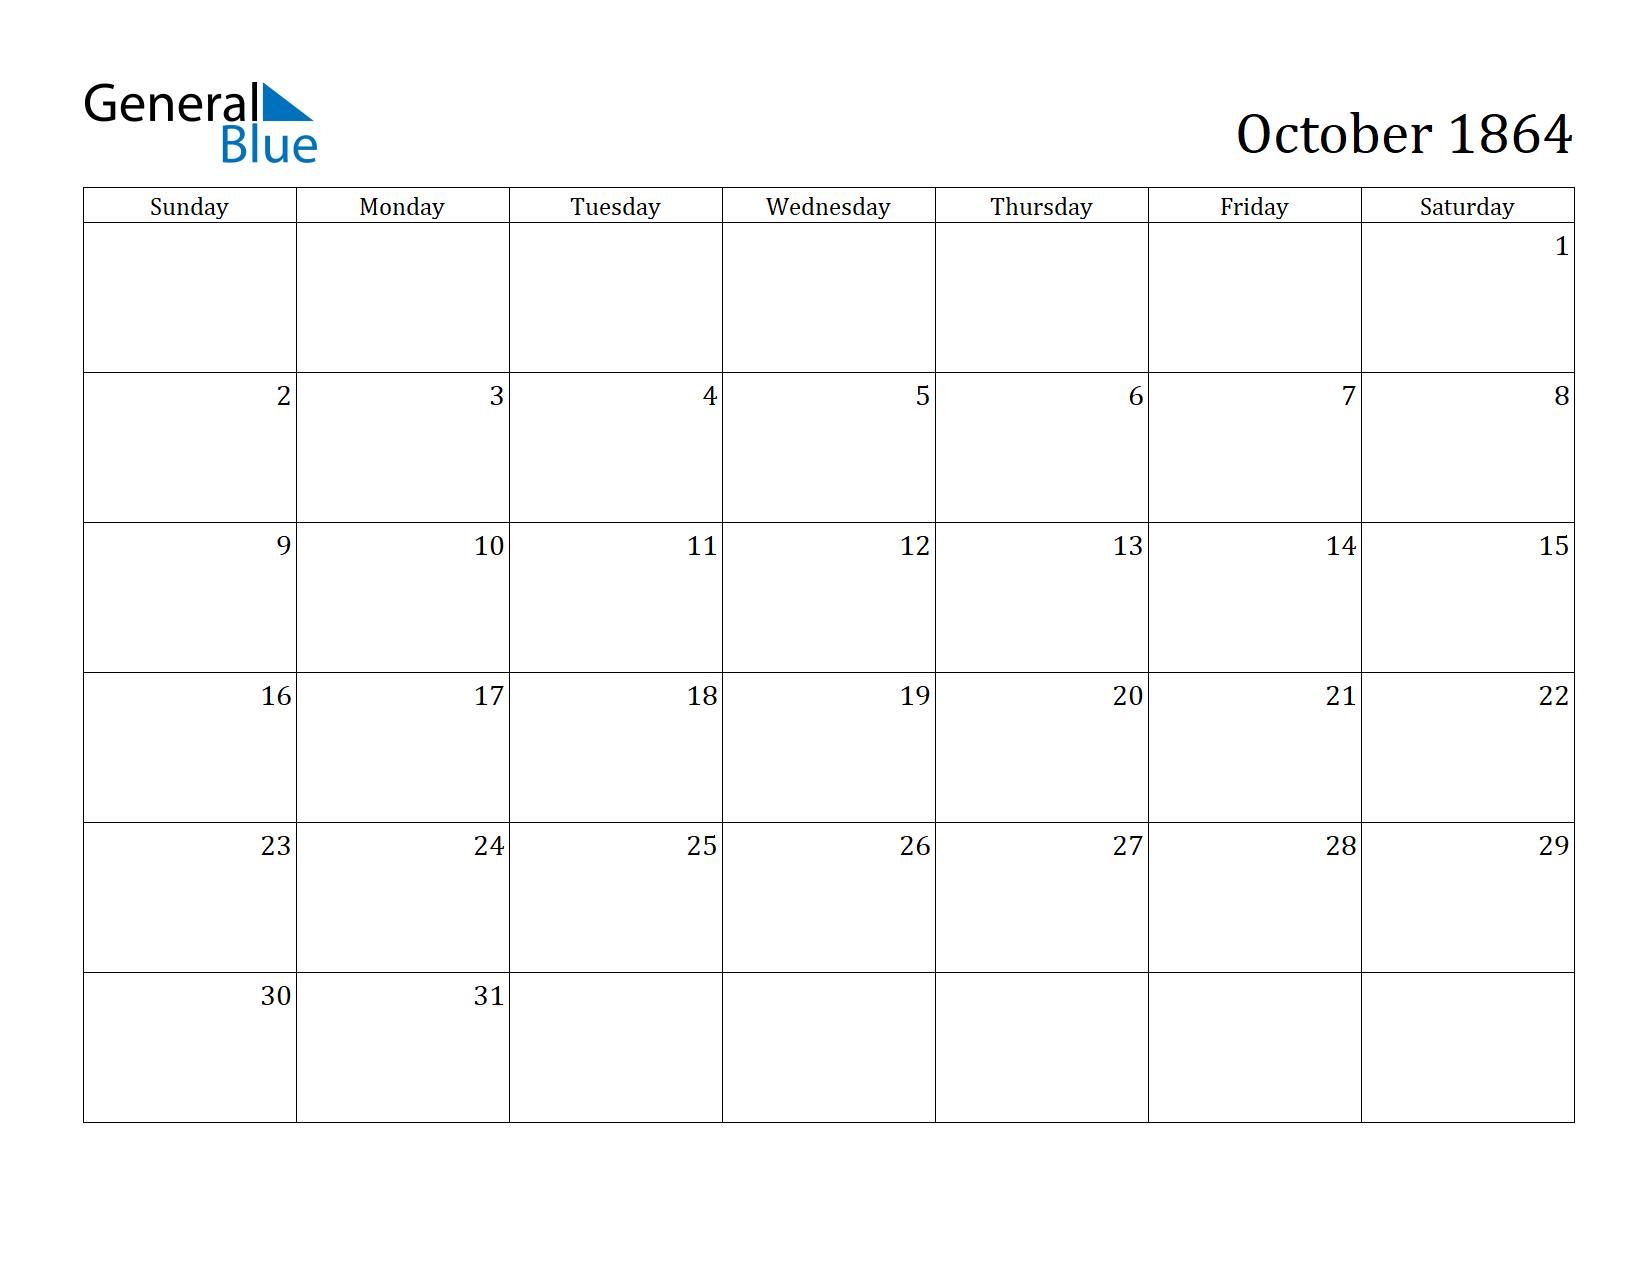 Image of October 1864 Calendar